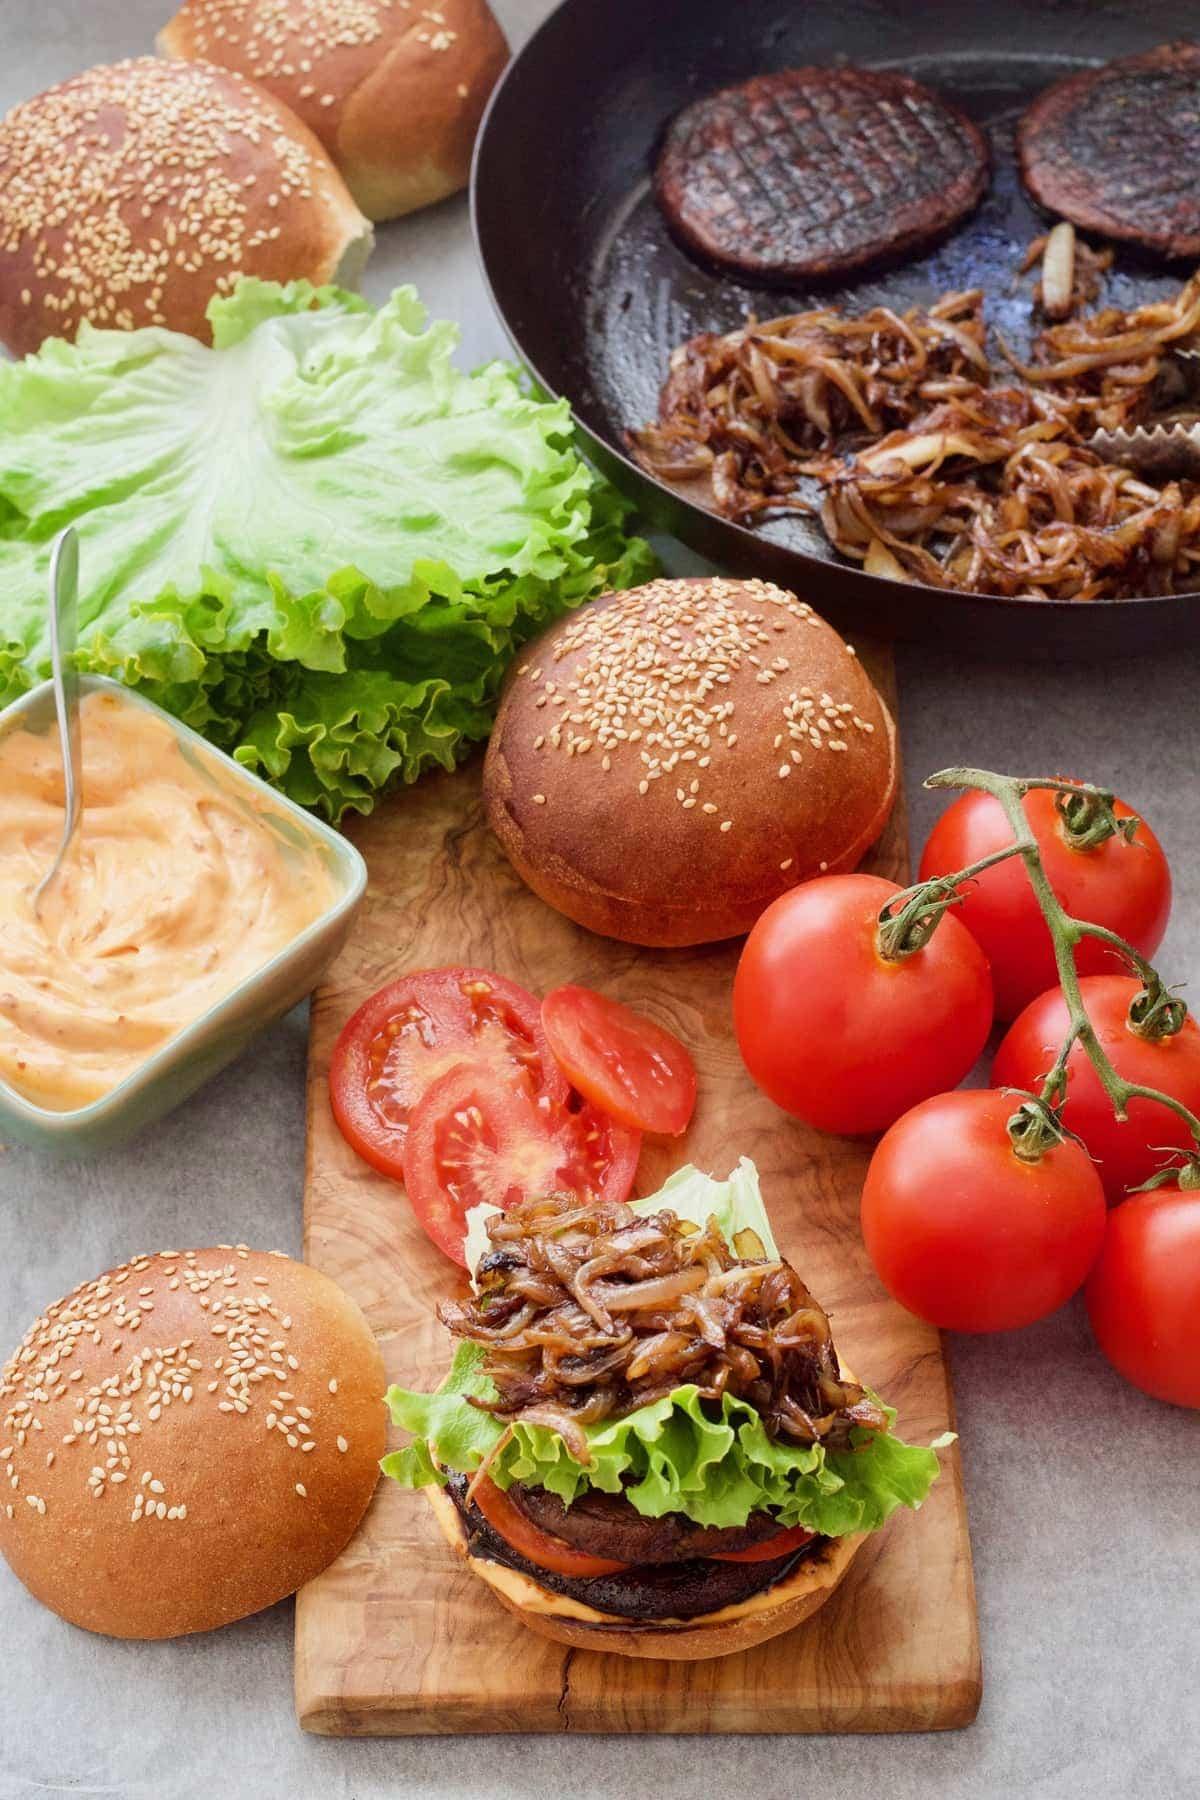 Portobello mushroom burger assembly with buns, tomatoes & lettuce.